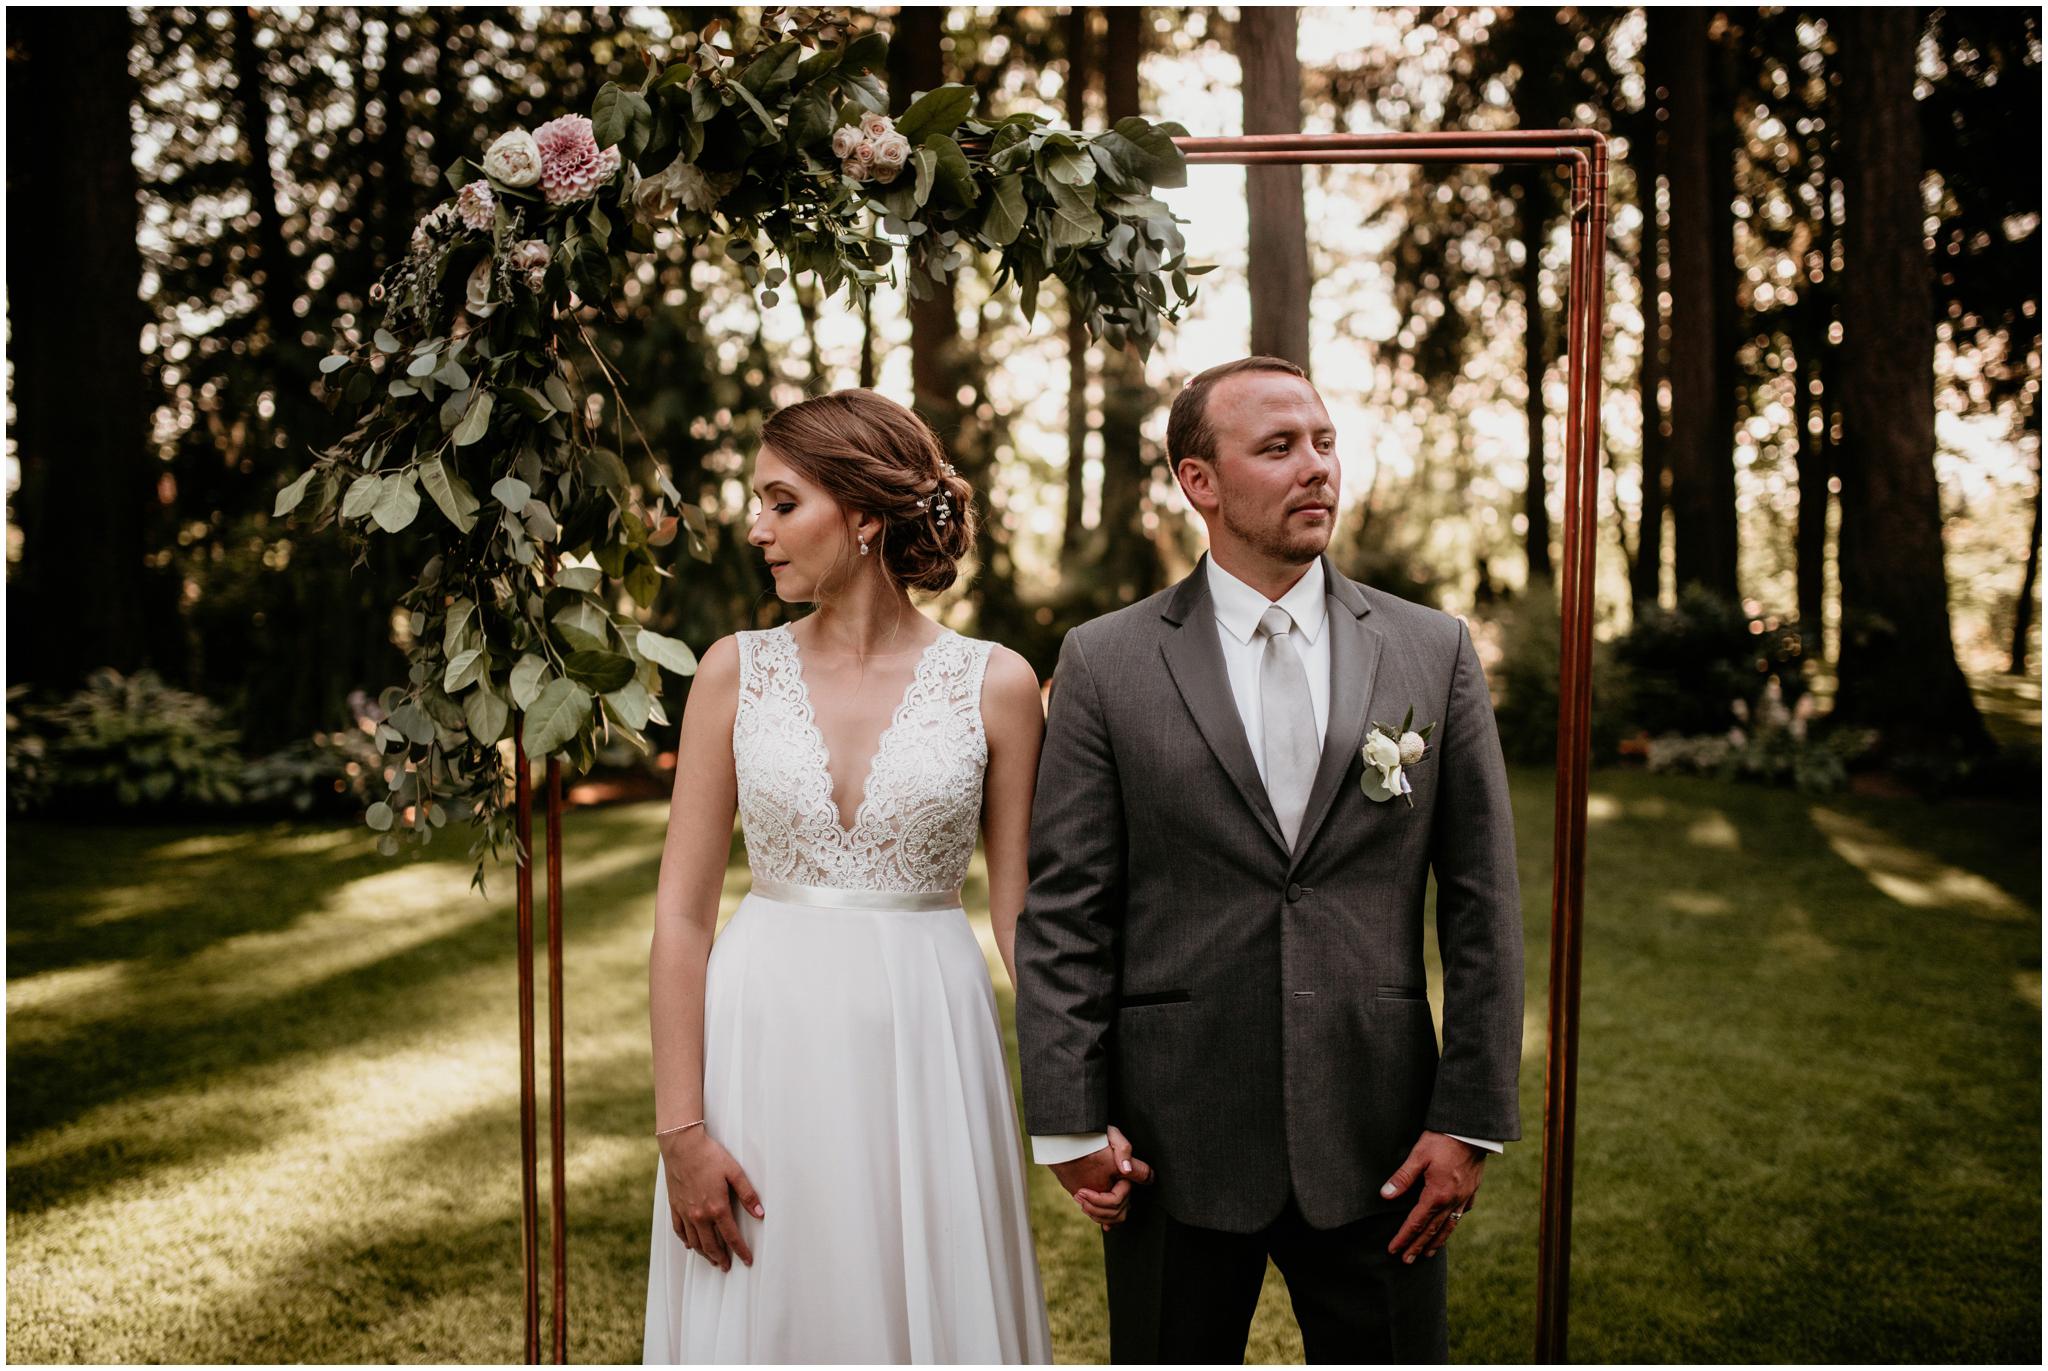 erin-and-tyler-evergreen-gardens-bellingham-wedding-photographer-131.jpg